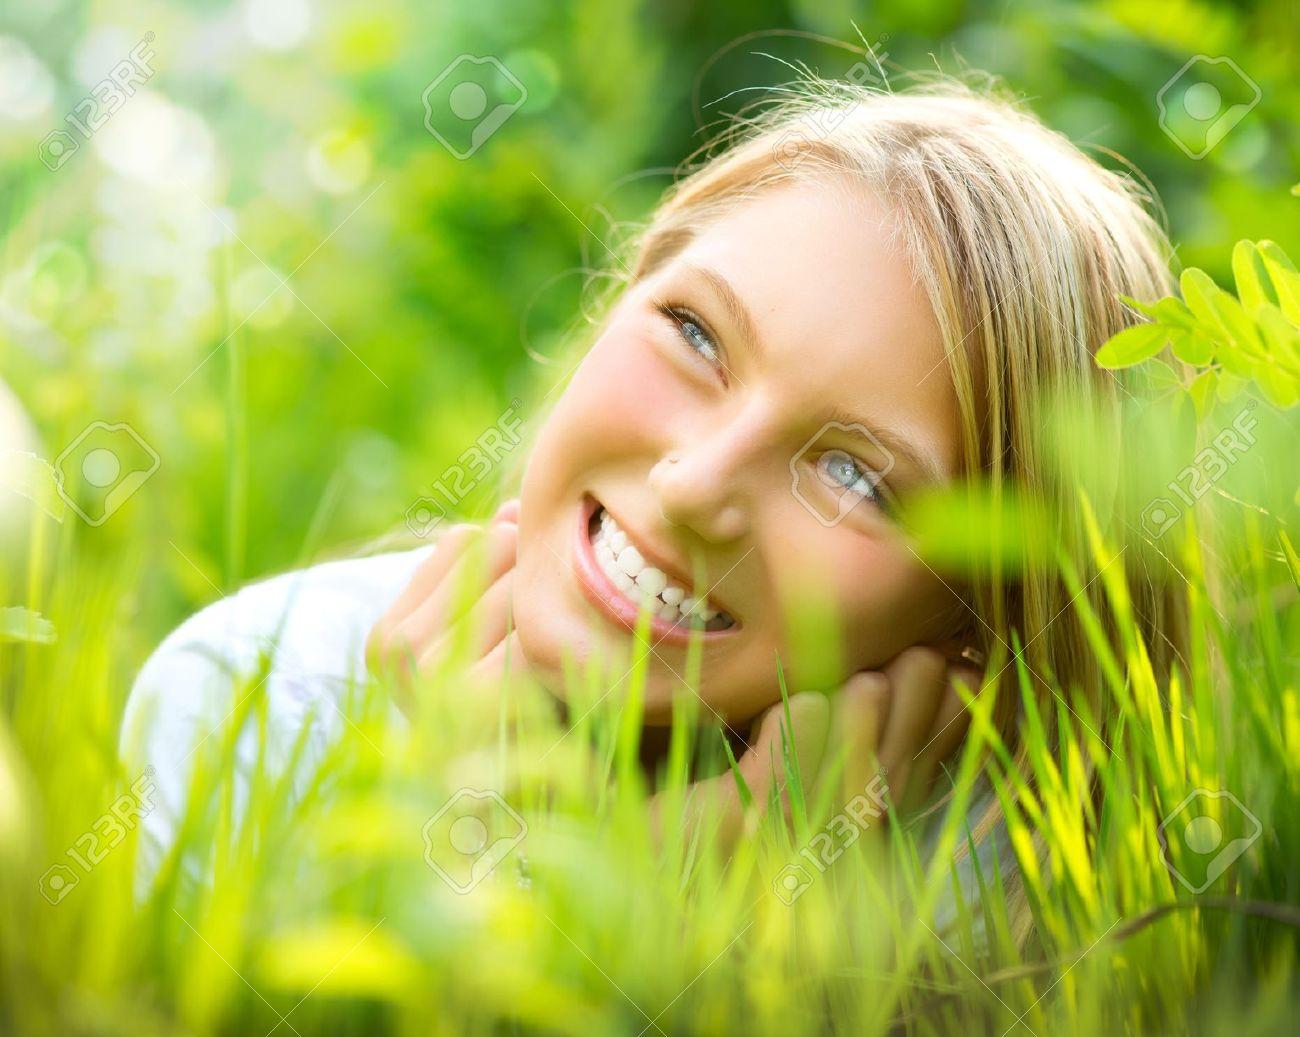 Beautiful Smiling Girl in Green Grass Stock Photo - 14719029